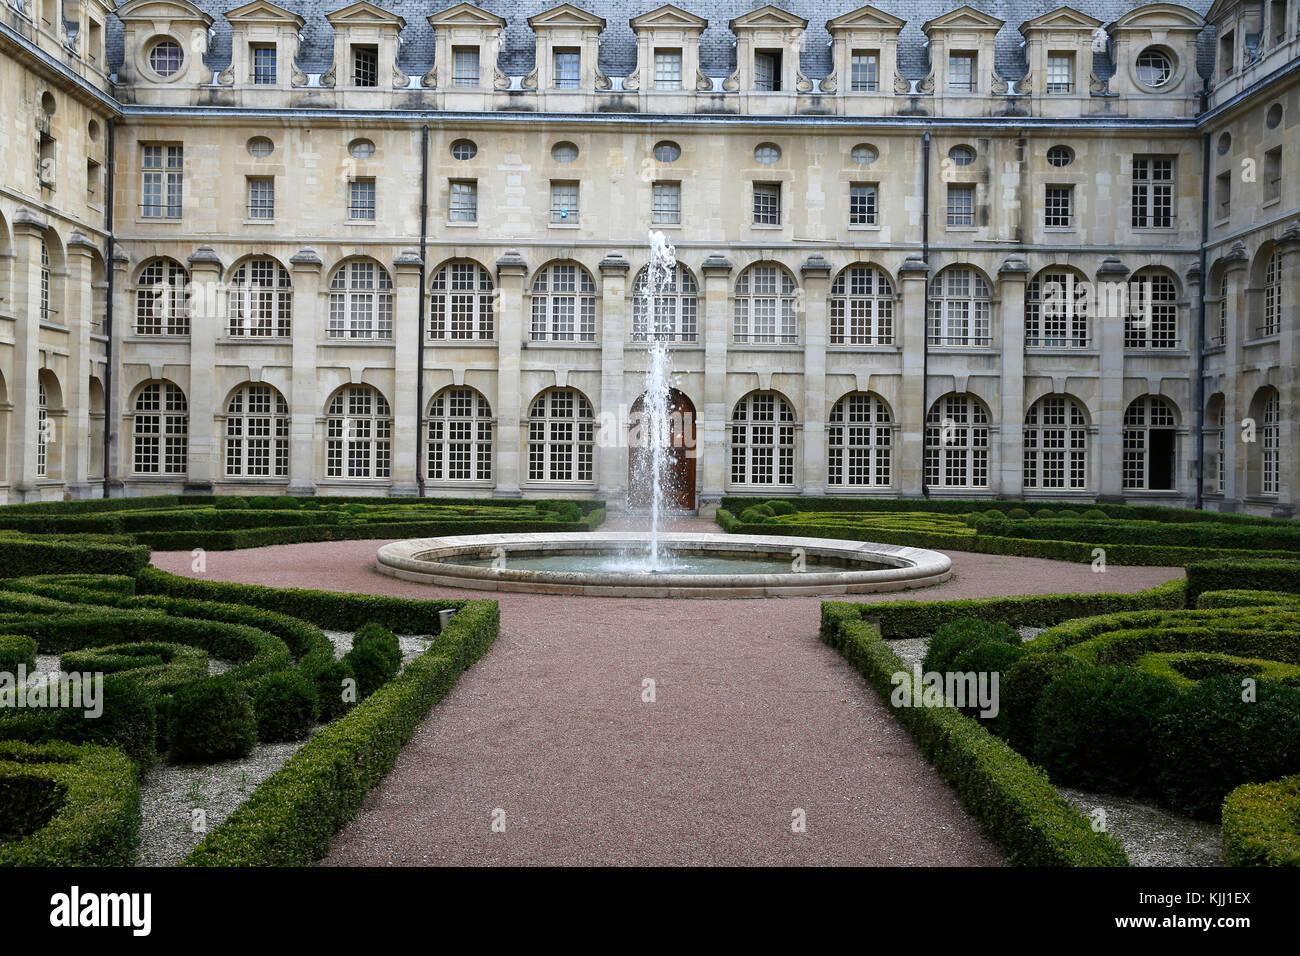 Val de Grace. Cloister garden. France. - Stock Image